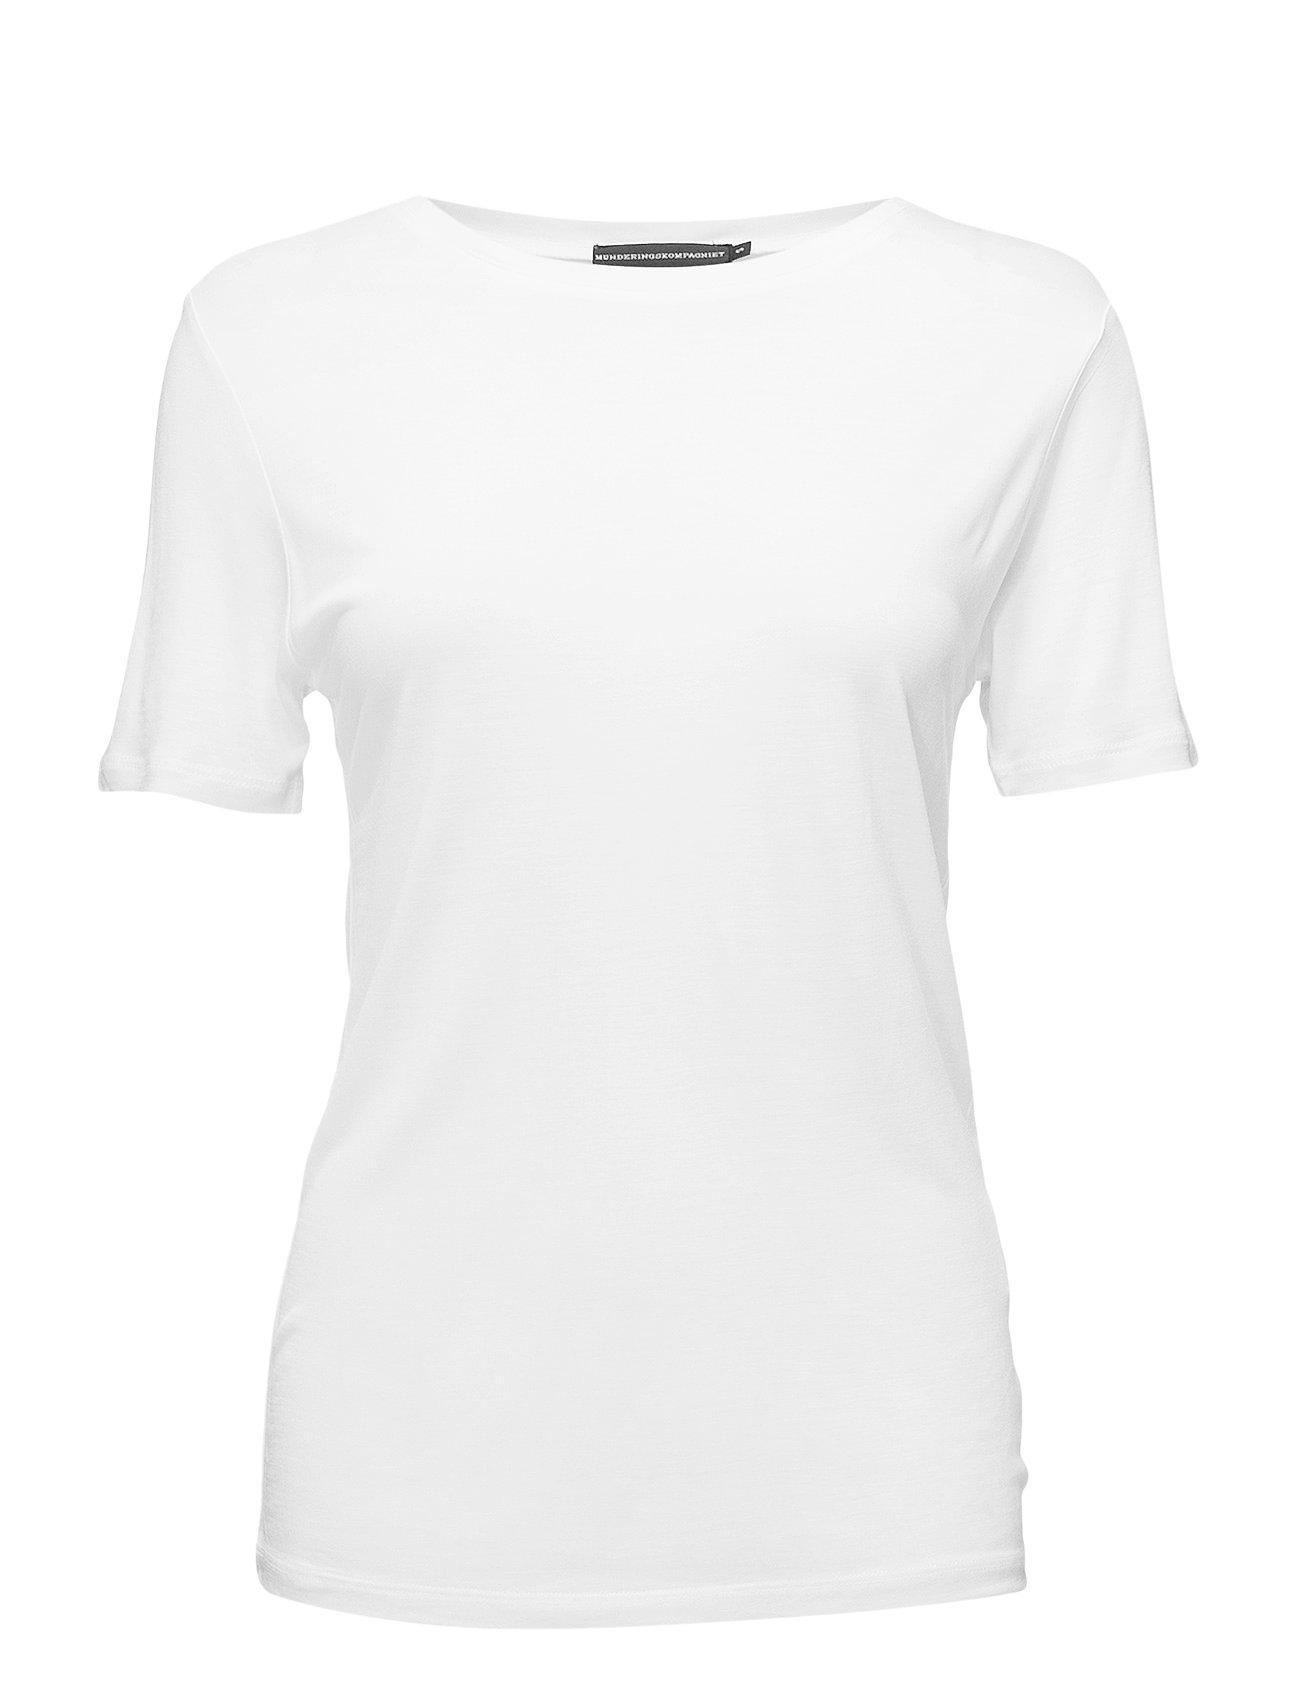 MDK / Munderingskompagniet Mdk t-shirt (black) - WHITE